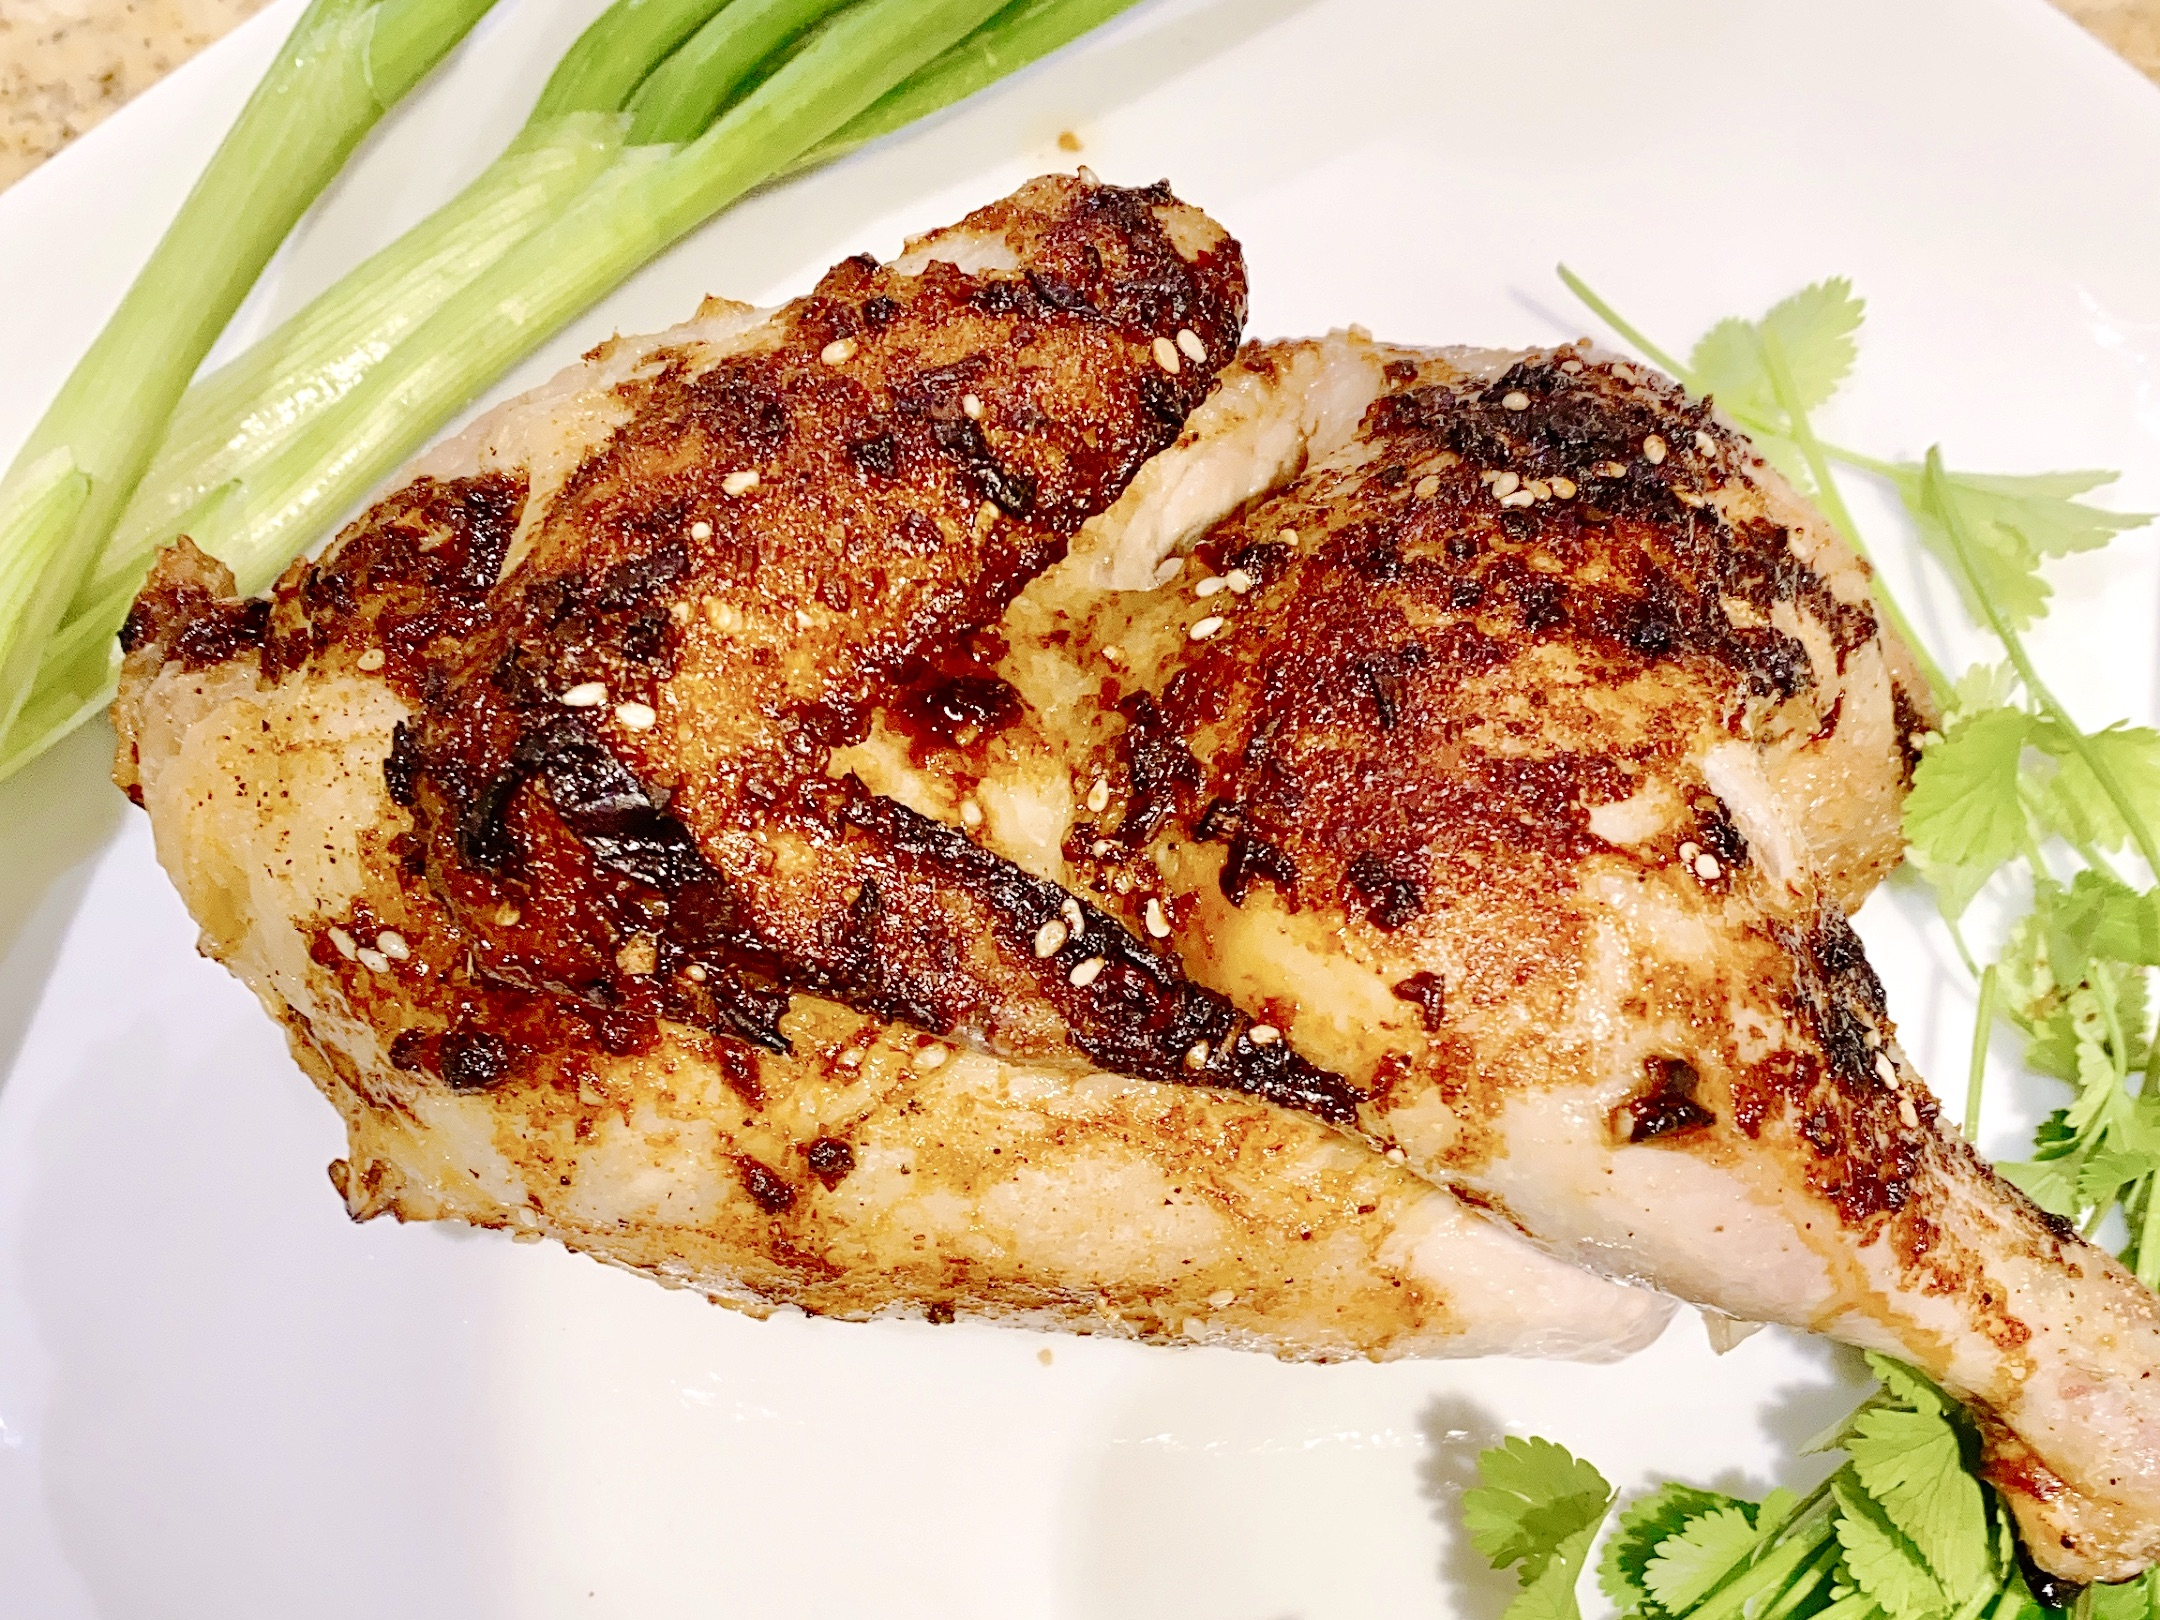 Recipe for Asian Chicken with Perdue Farms half chicken, green onion and cilantro